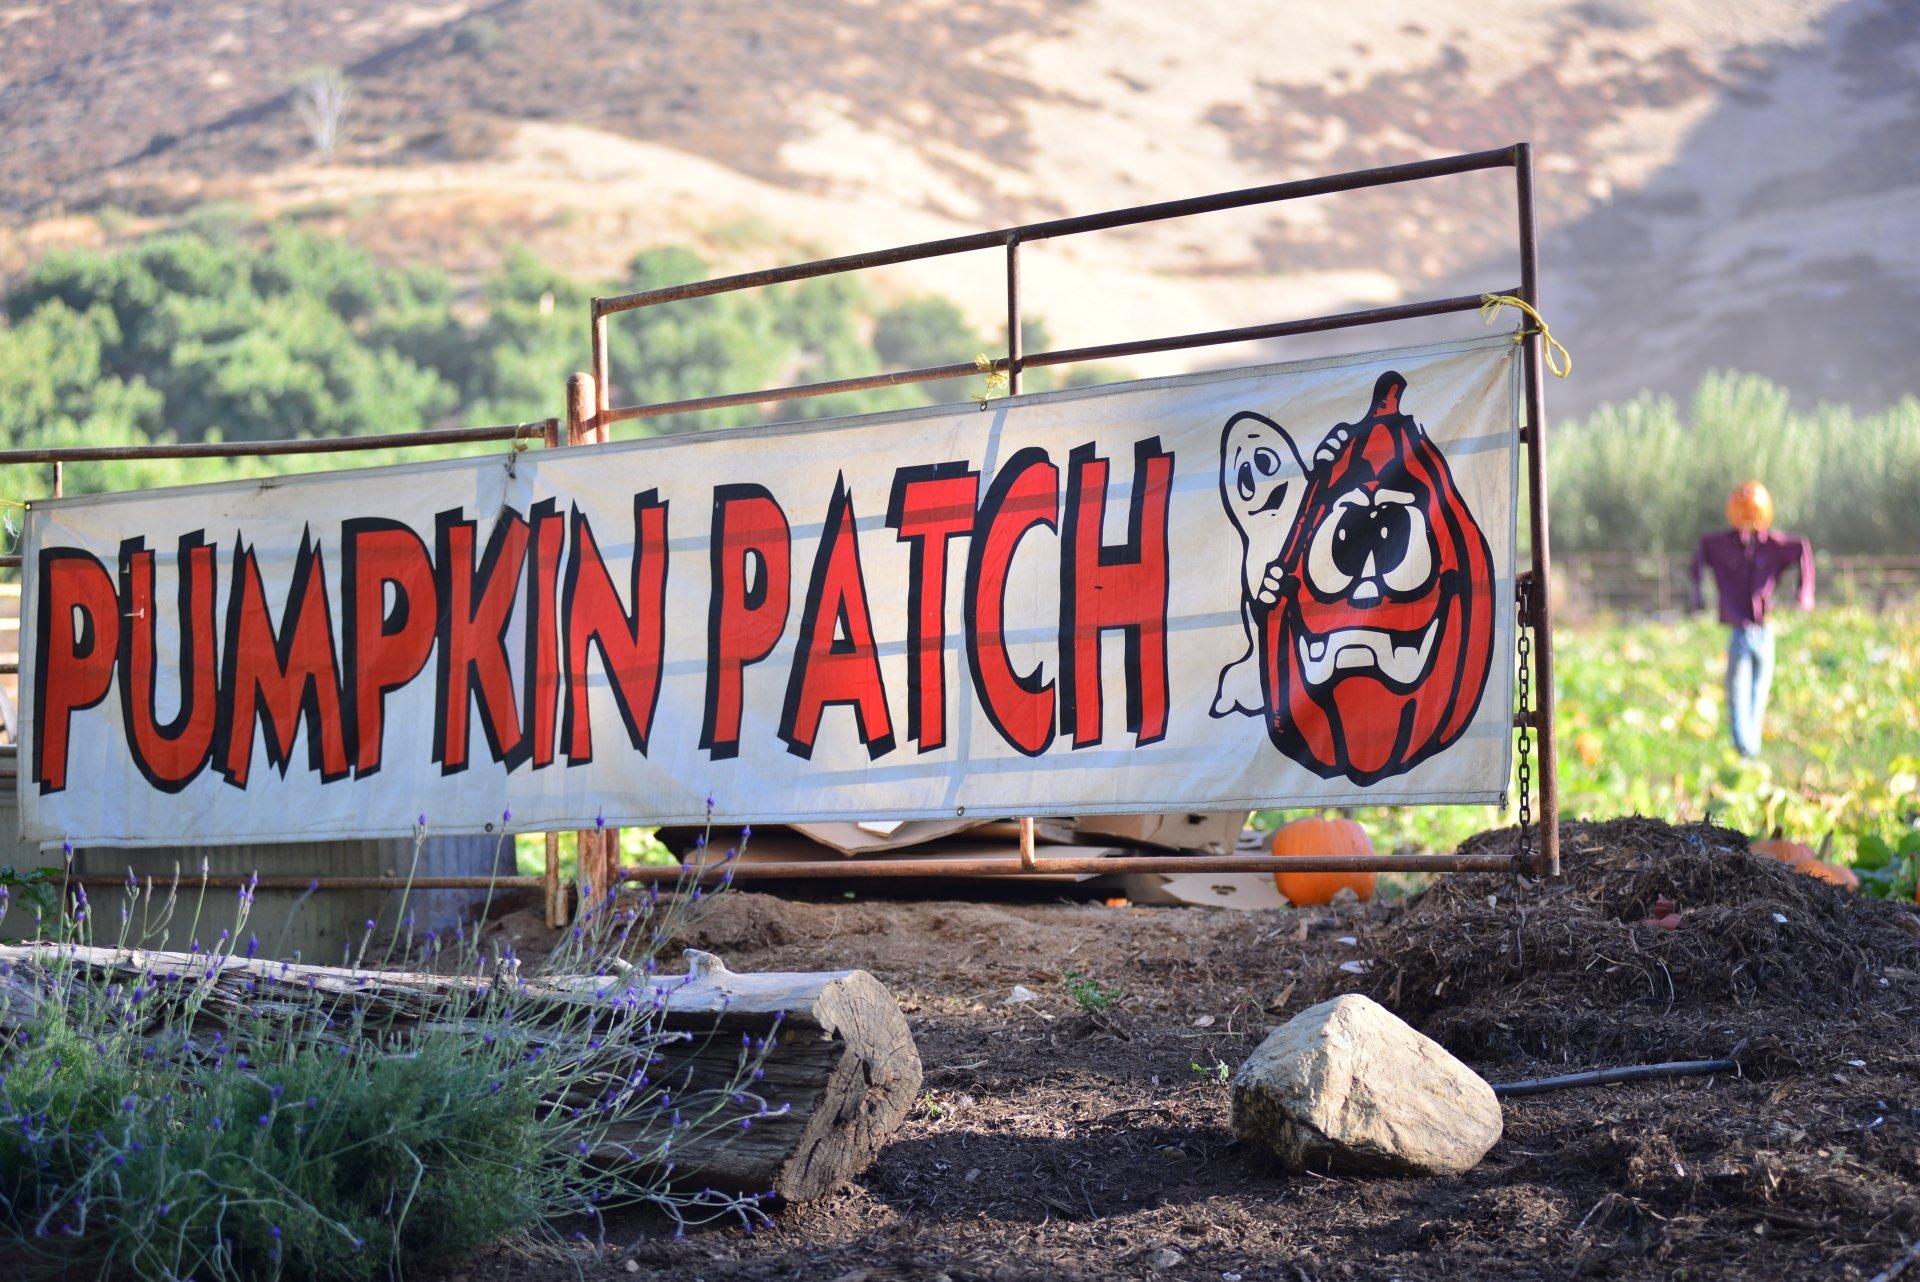 Pumpkin Patch at Greenspot Farms In Mentone CA Halloween 2018